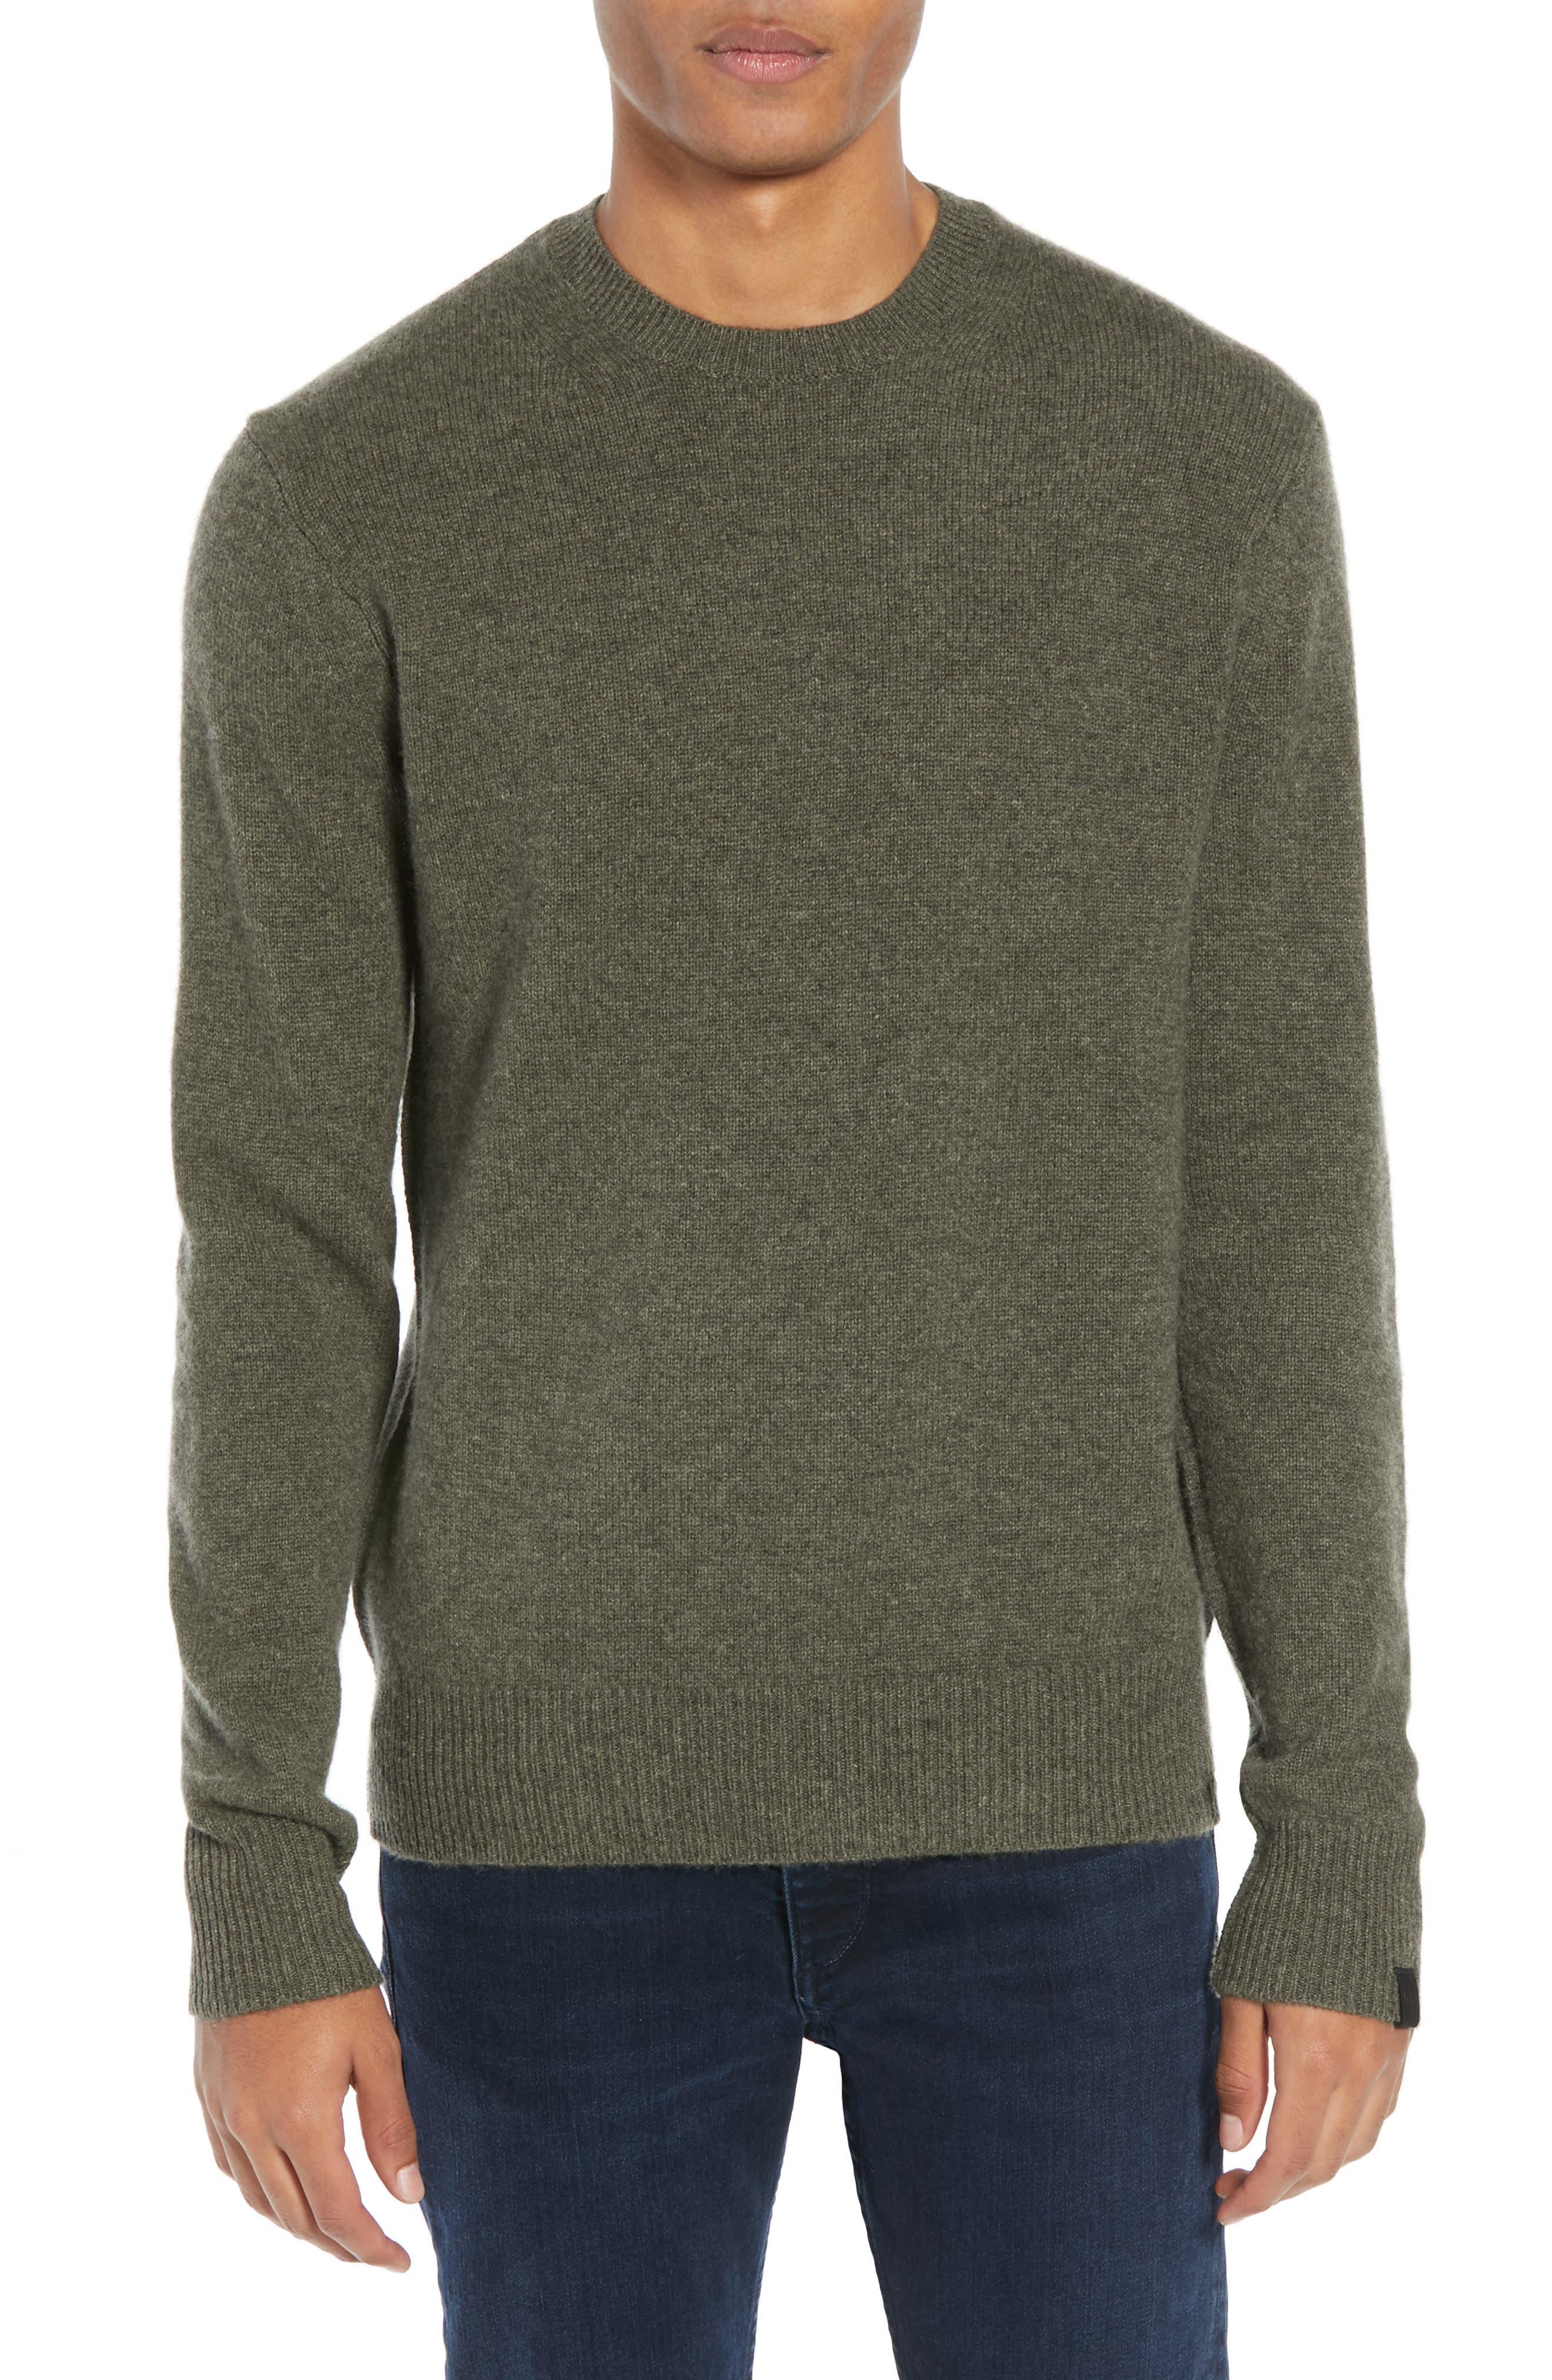 Rag And Bone Khaki Cashmere Haldon Sweater in 311 Army